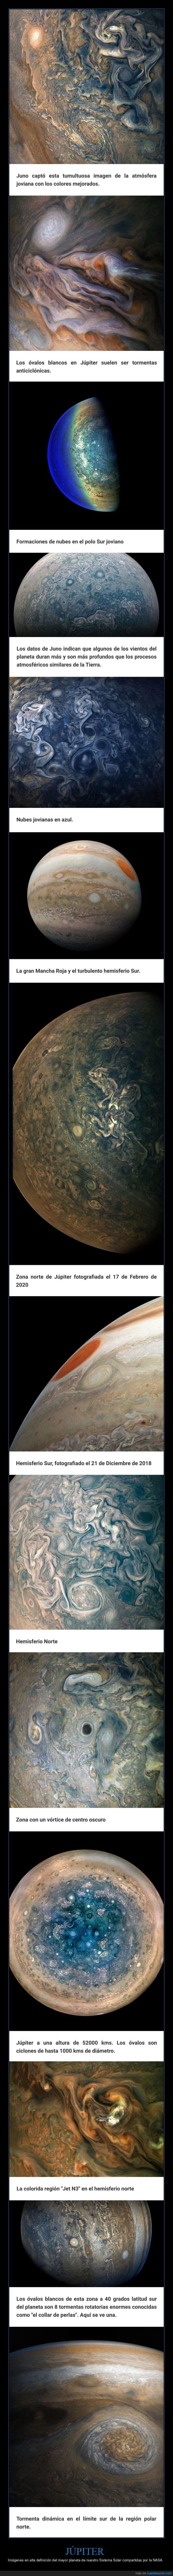 júpiter,nasa,planeta